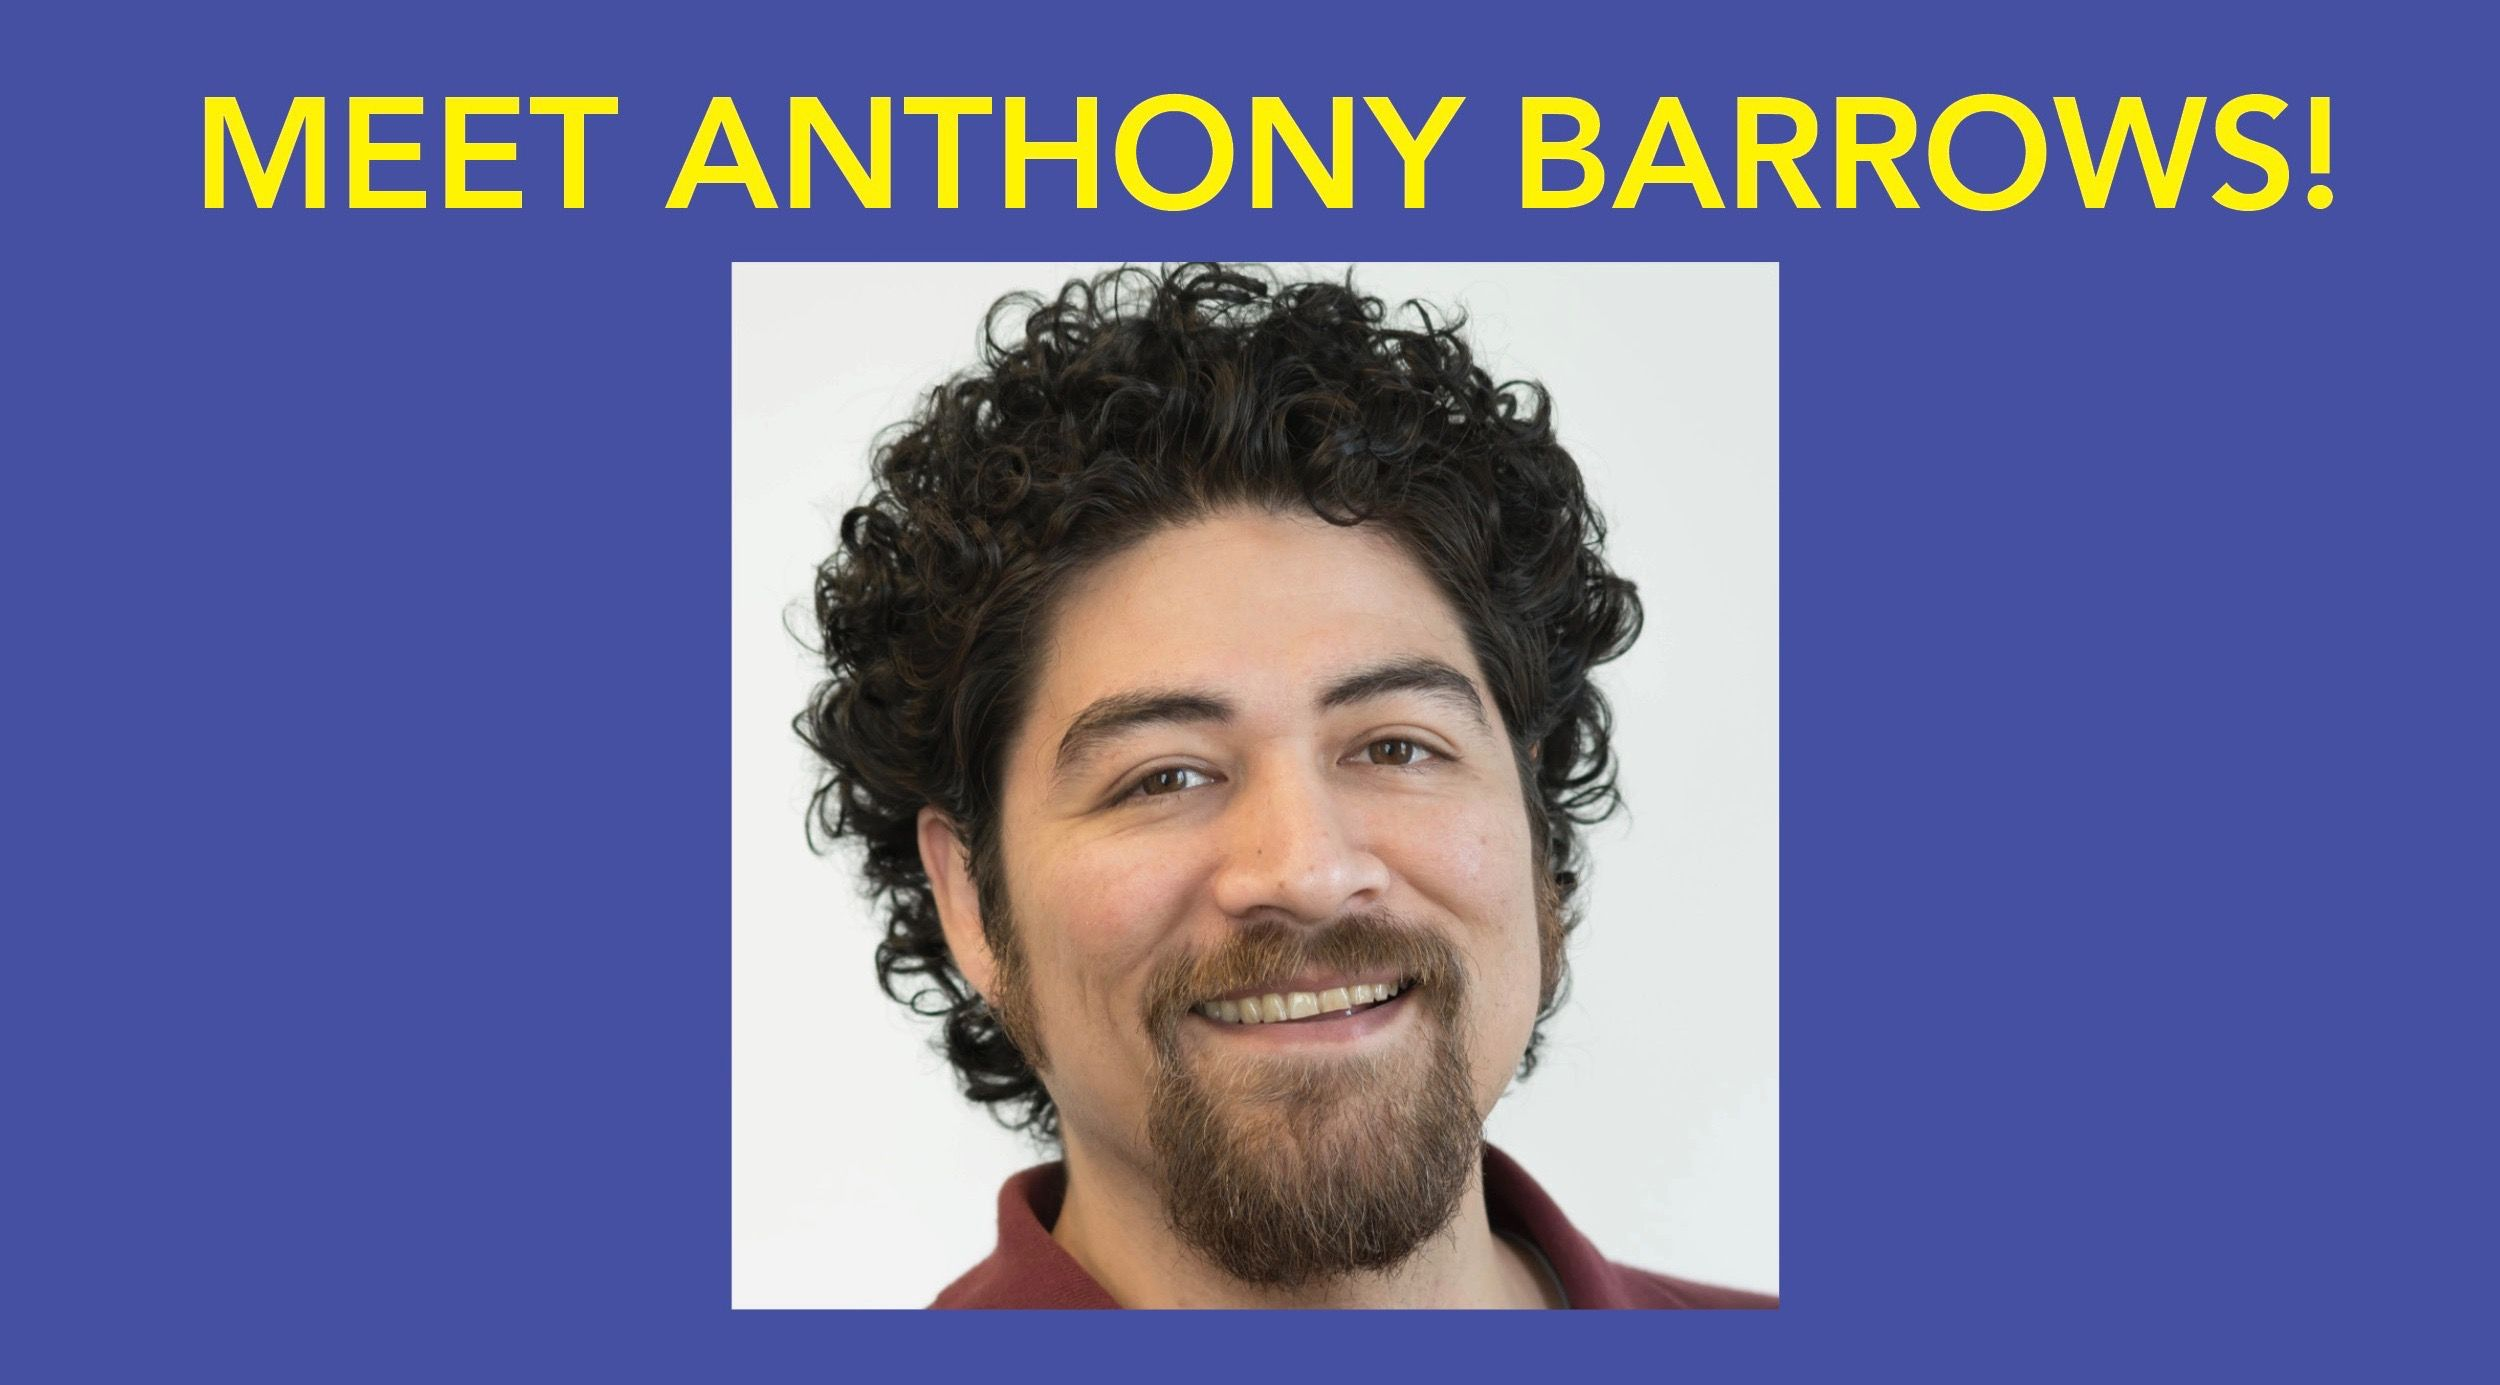 Meet Anthony Barrows